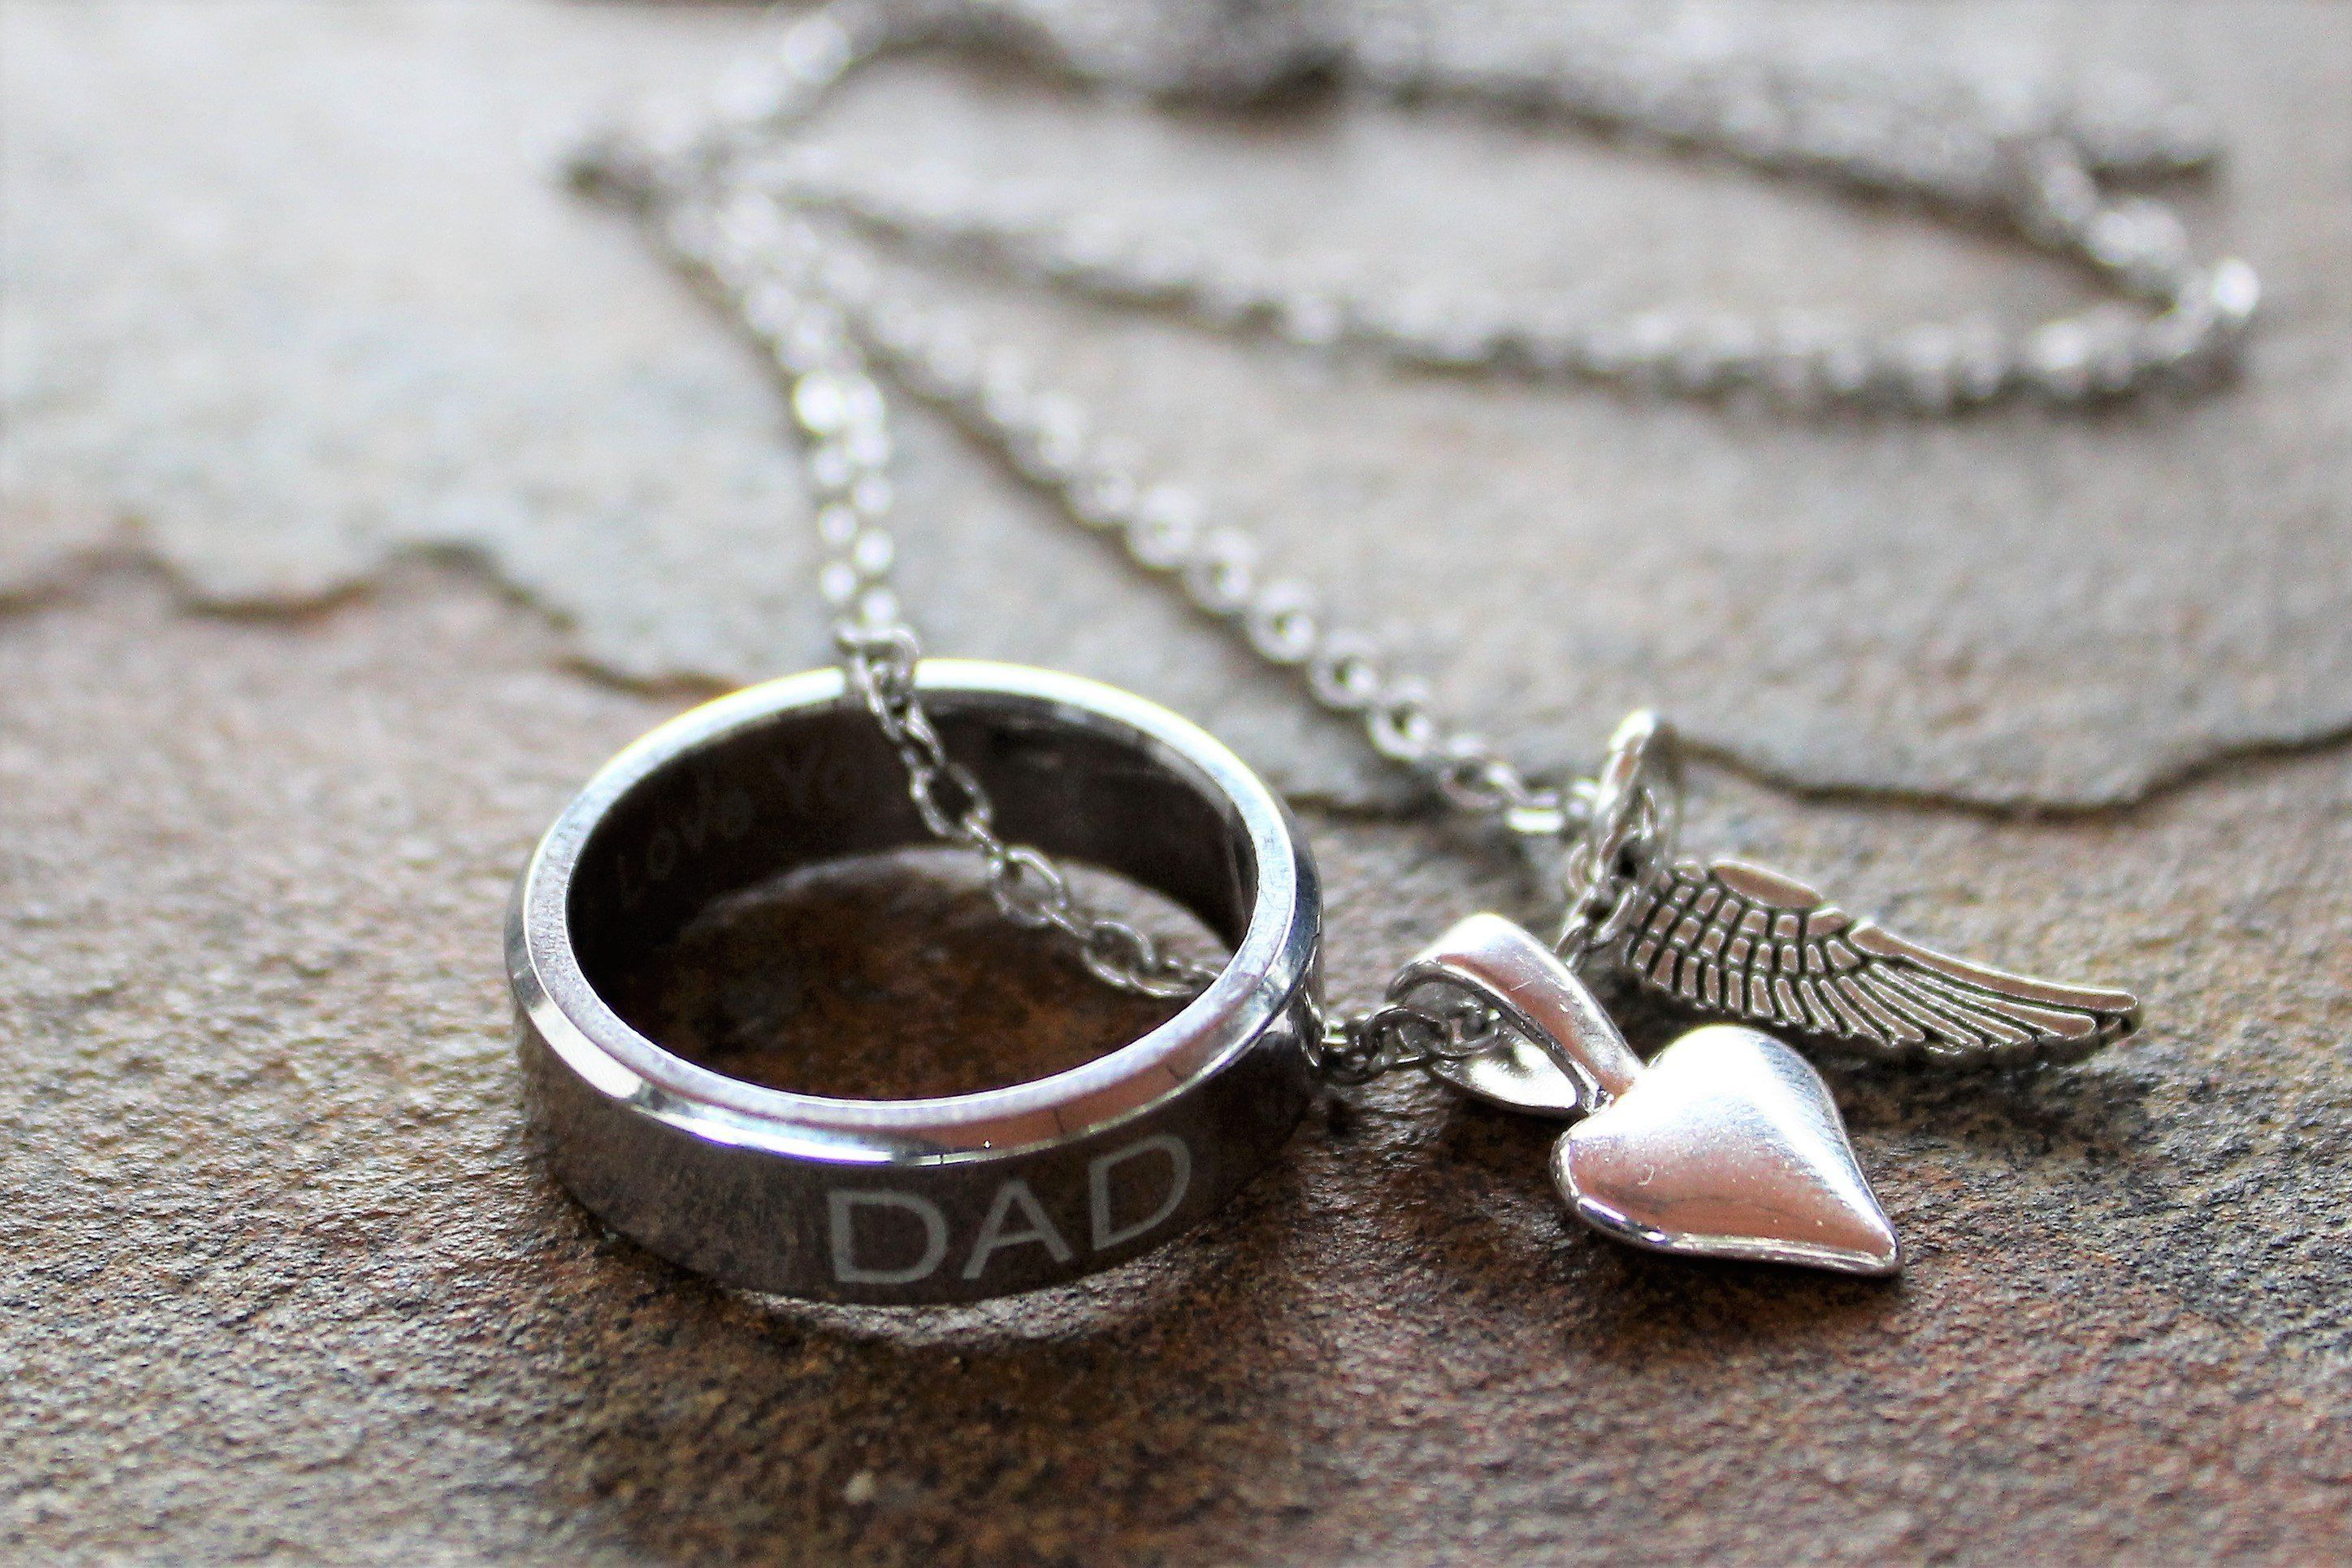 Dad memory necklaceunisex necklace jewellery shop